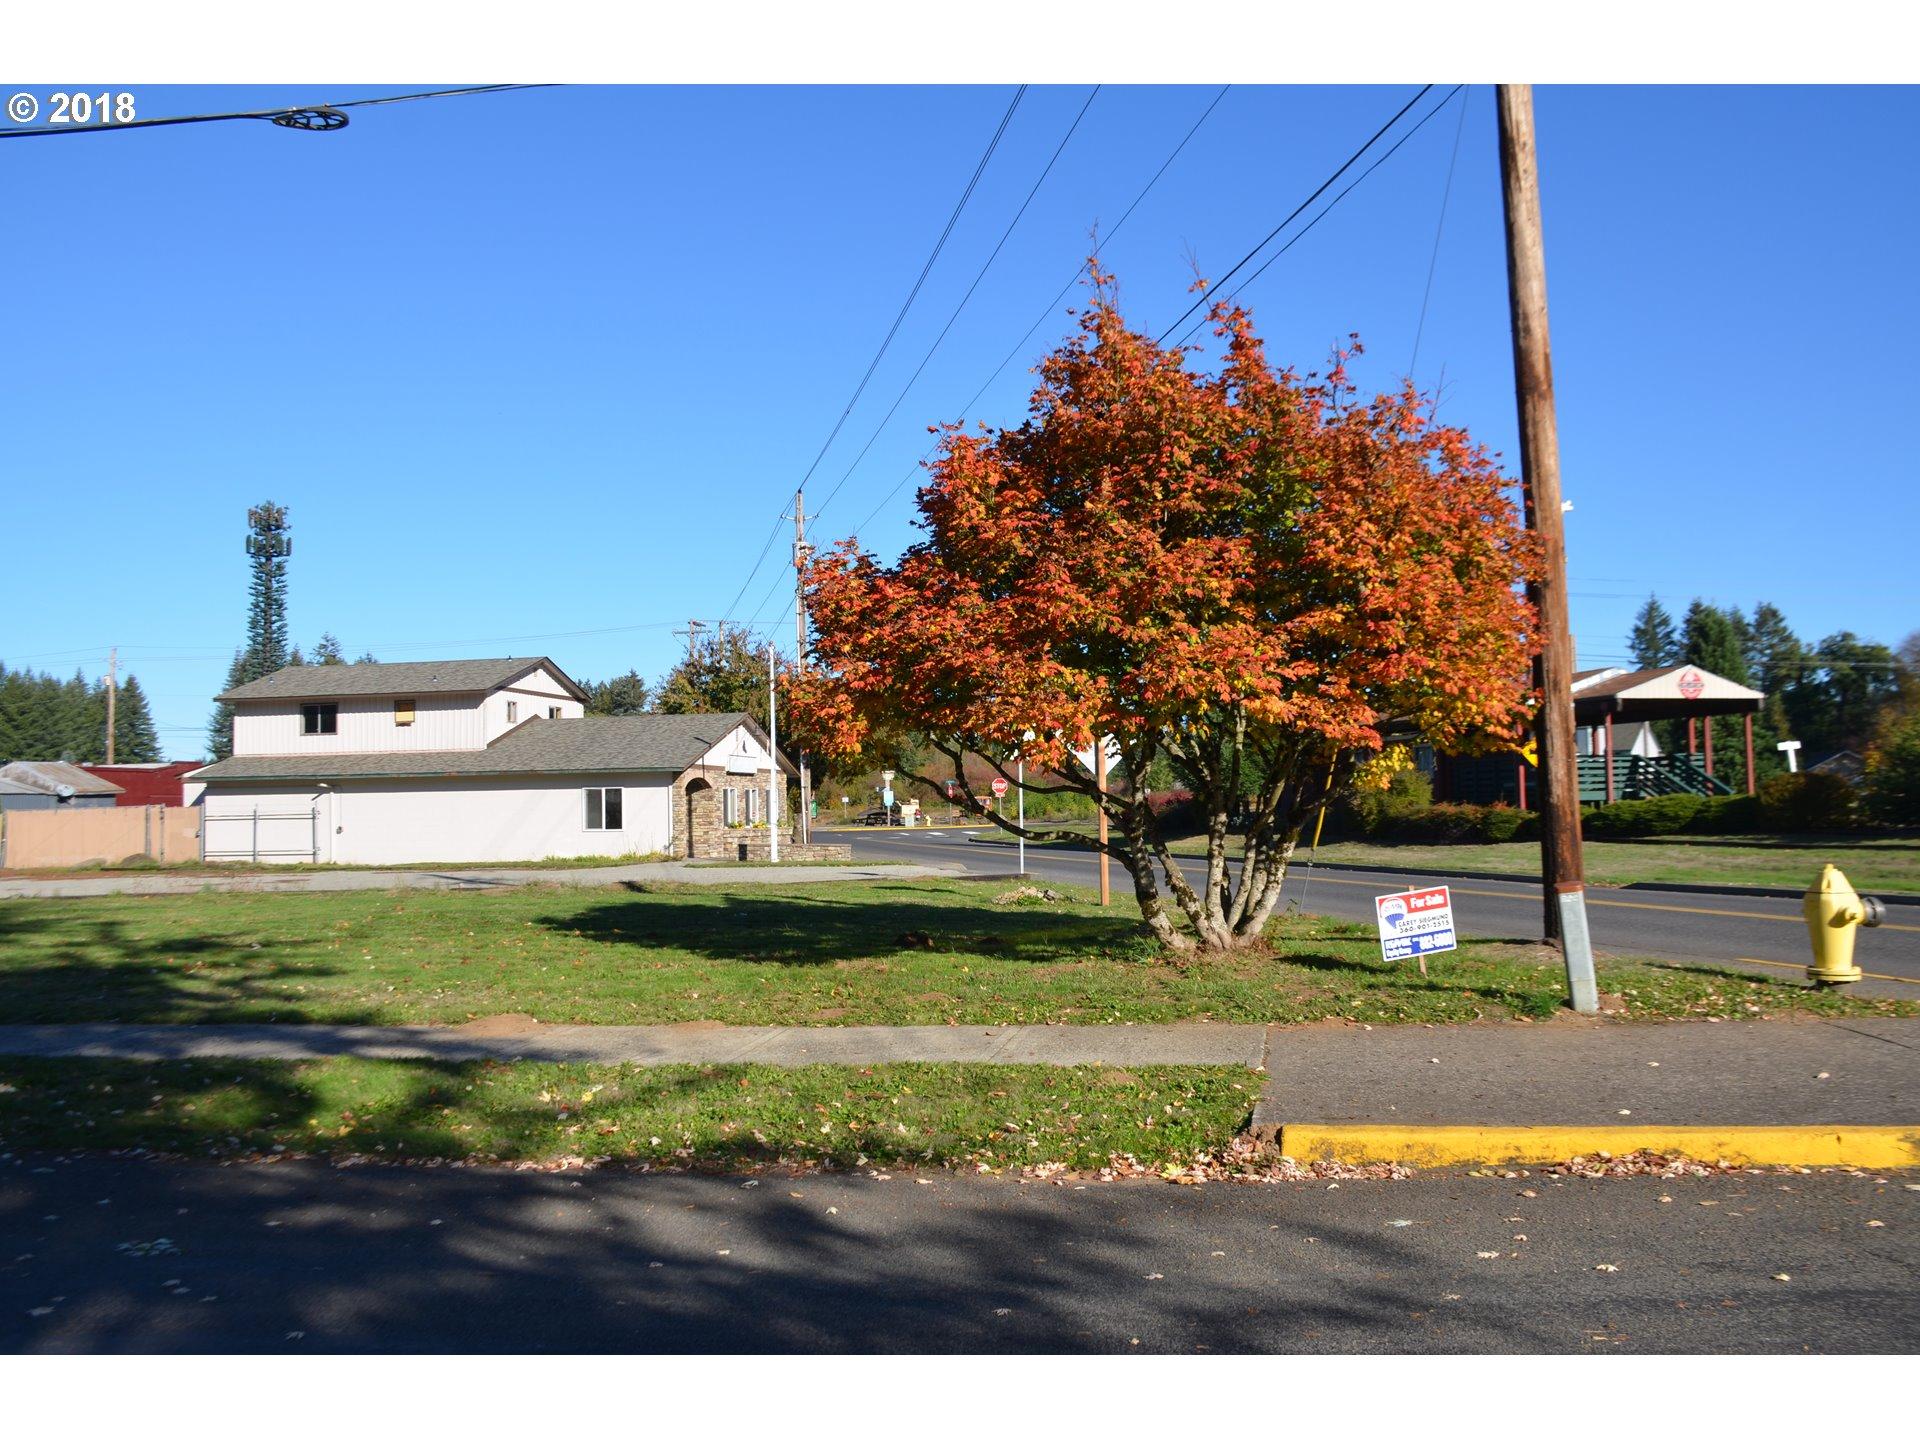 206 N Railroad Ave, Yacolt, WA 98675